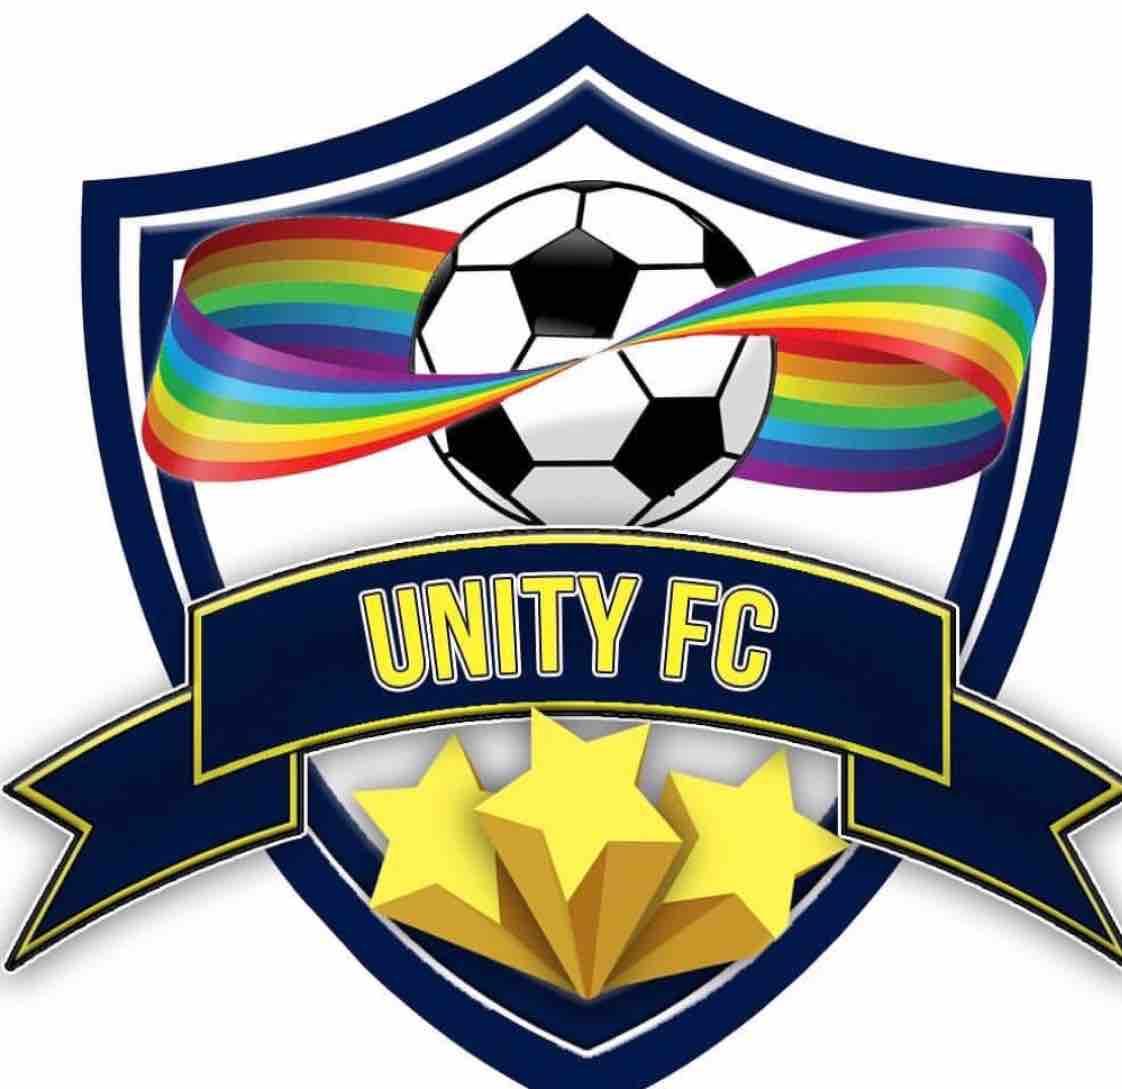 unity fc.jpg